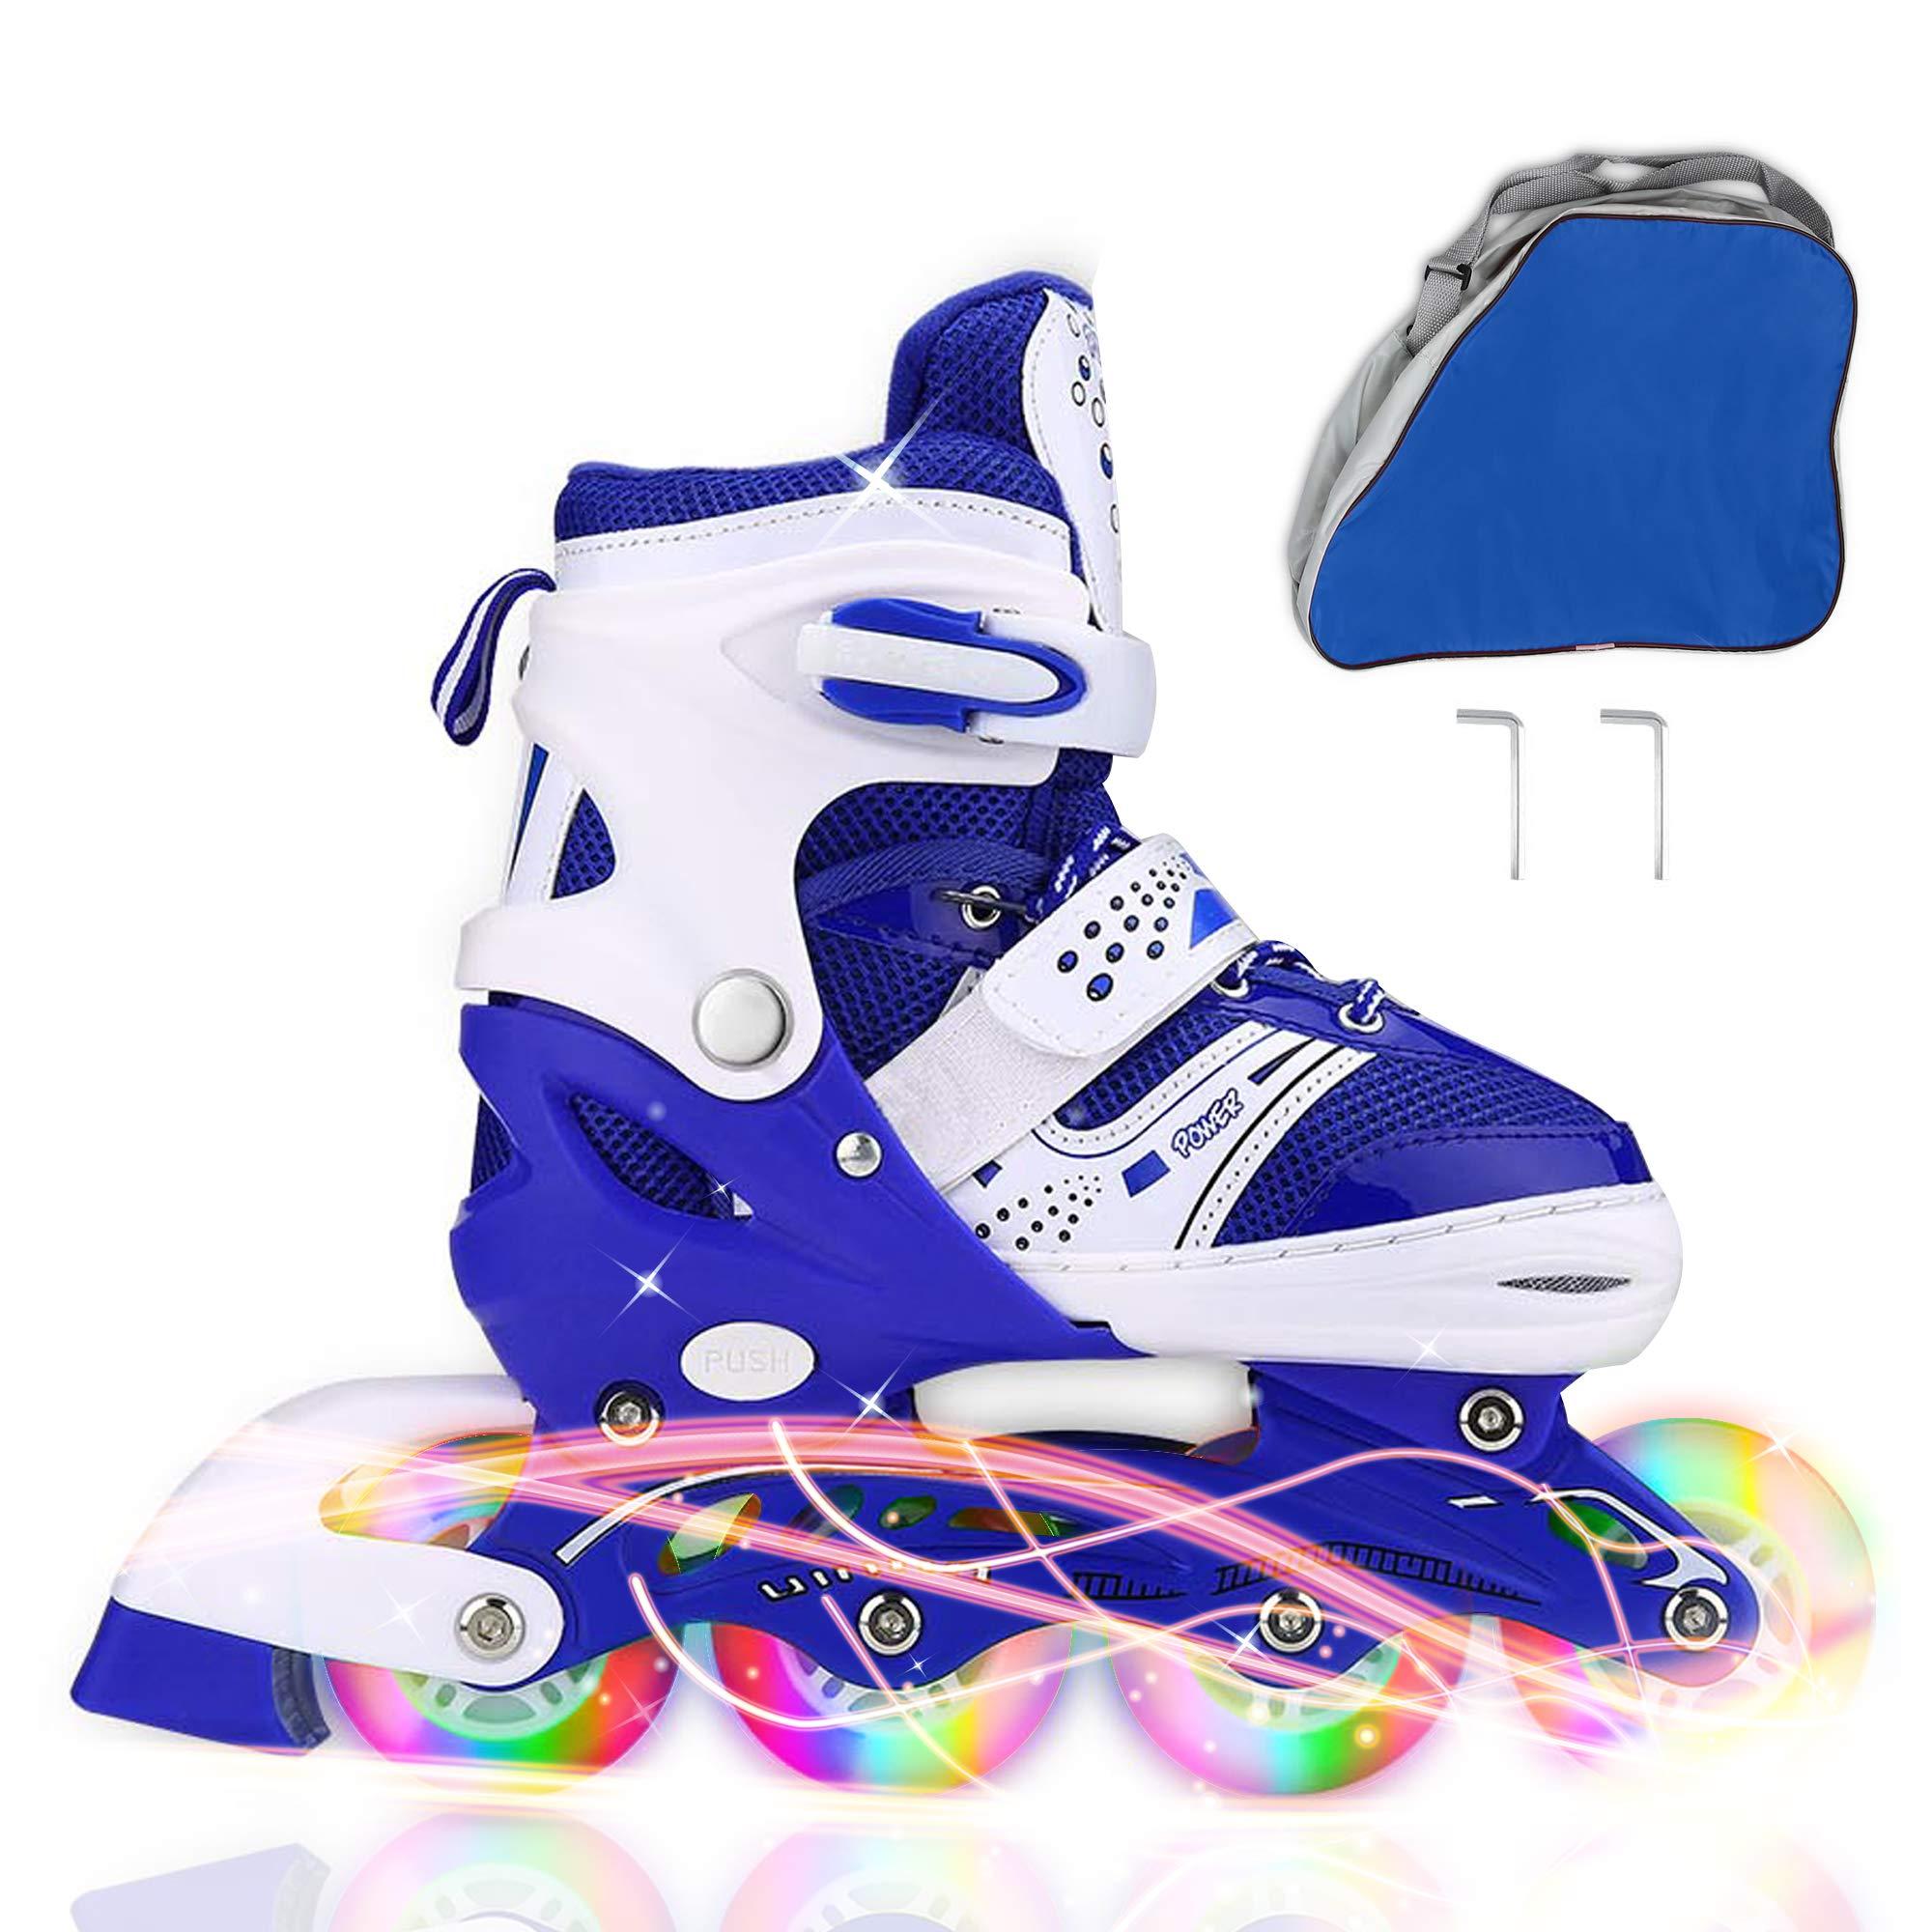 JIFAR Adjustable Inline Skates Kids, Roller Skates All Wheels Light Up Illuminating Rollerblades Girls Boy, Ladies,30-Day Guarantee!